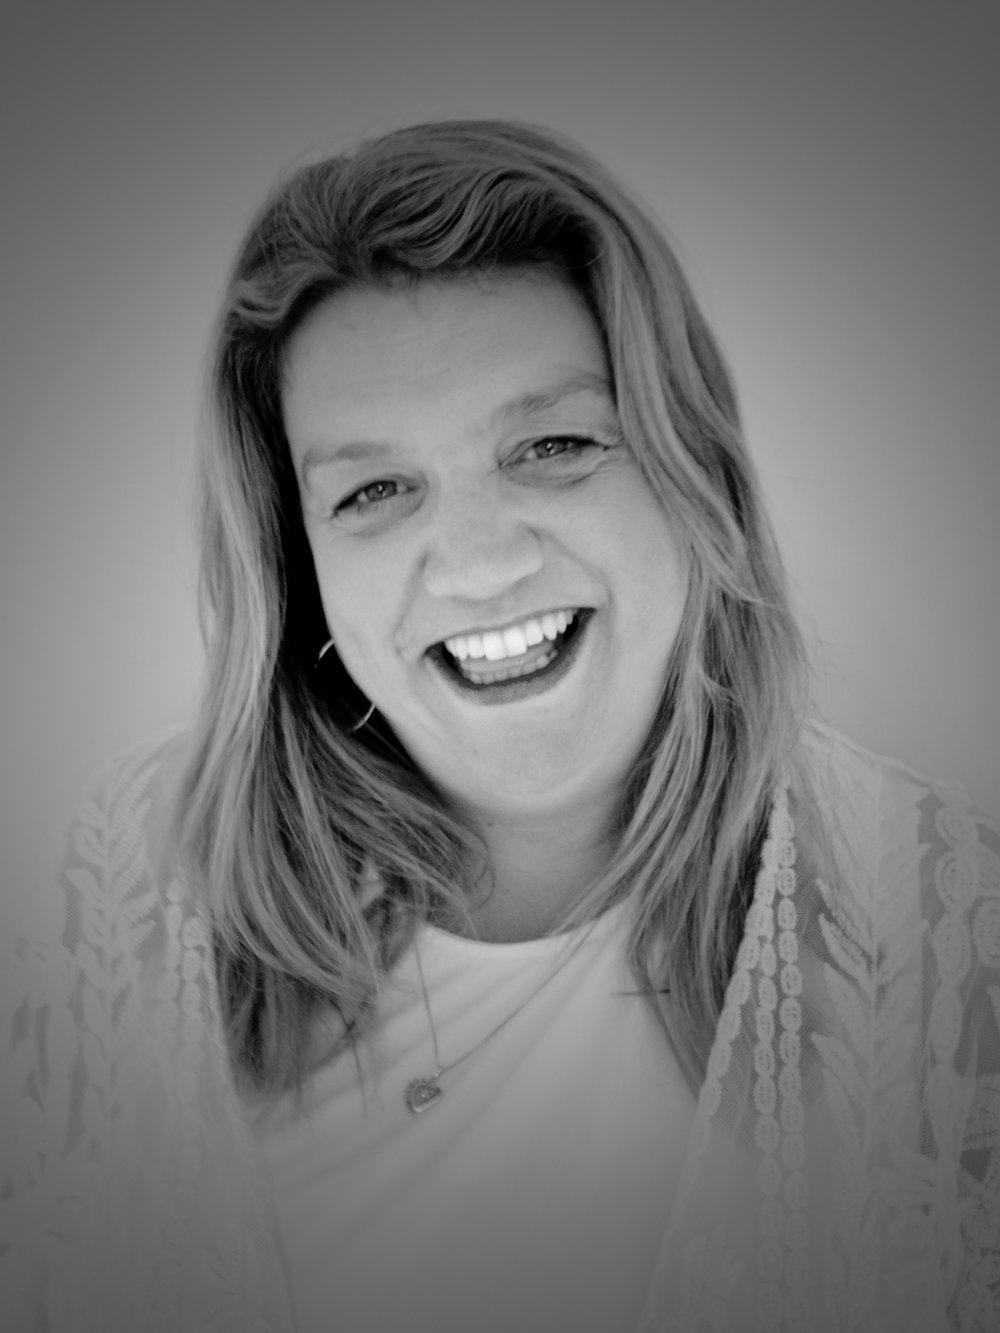 Professor Liz Barnes - DeputyUniversity of Manchester